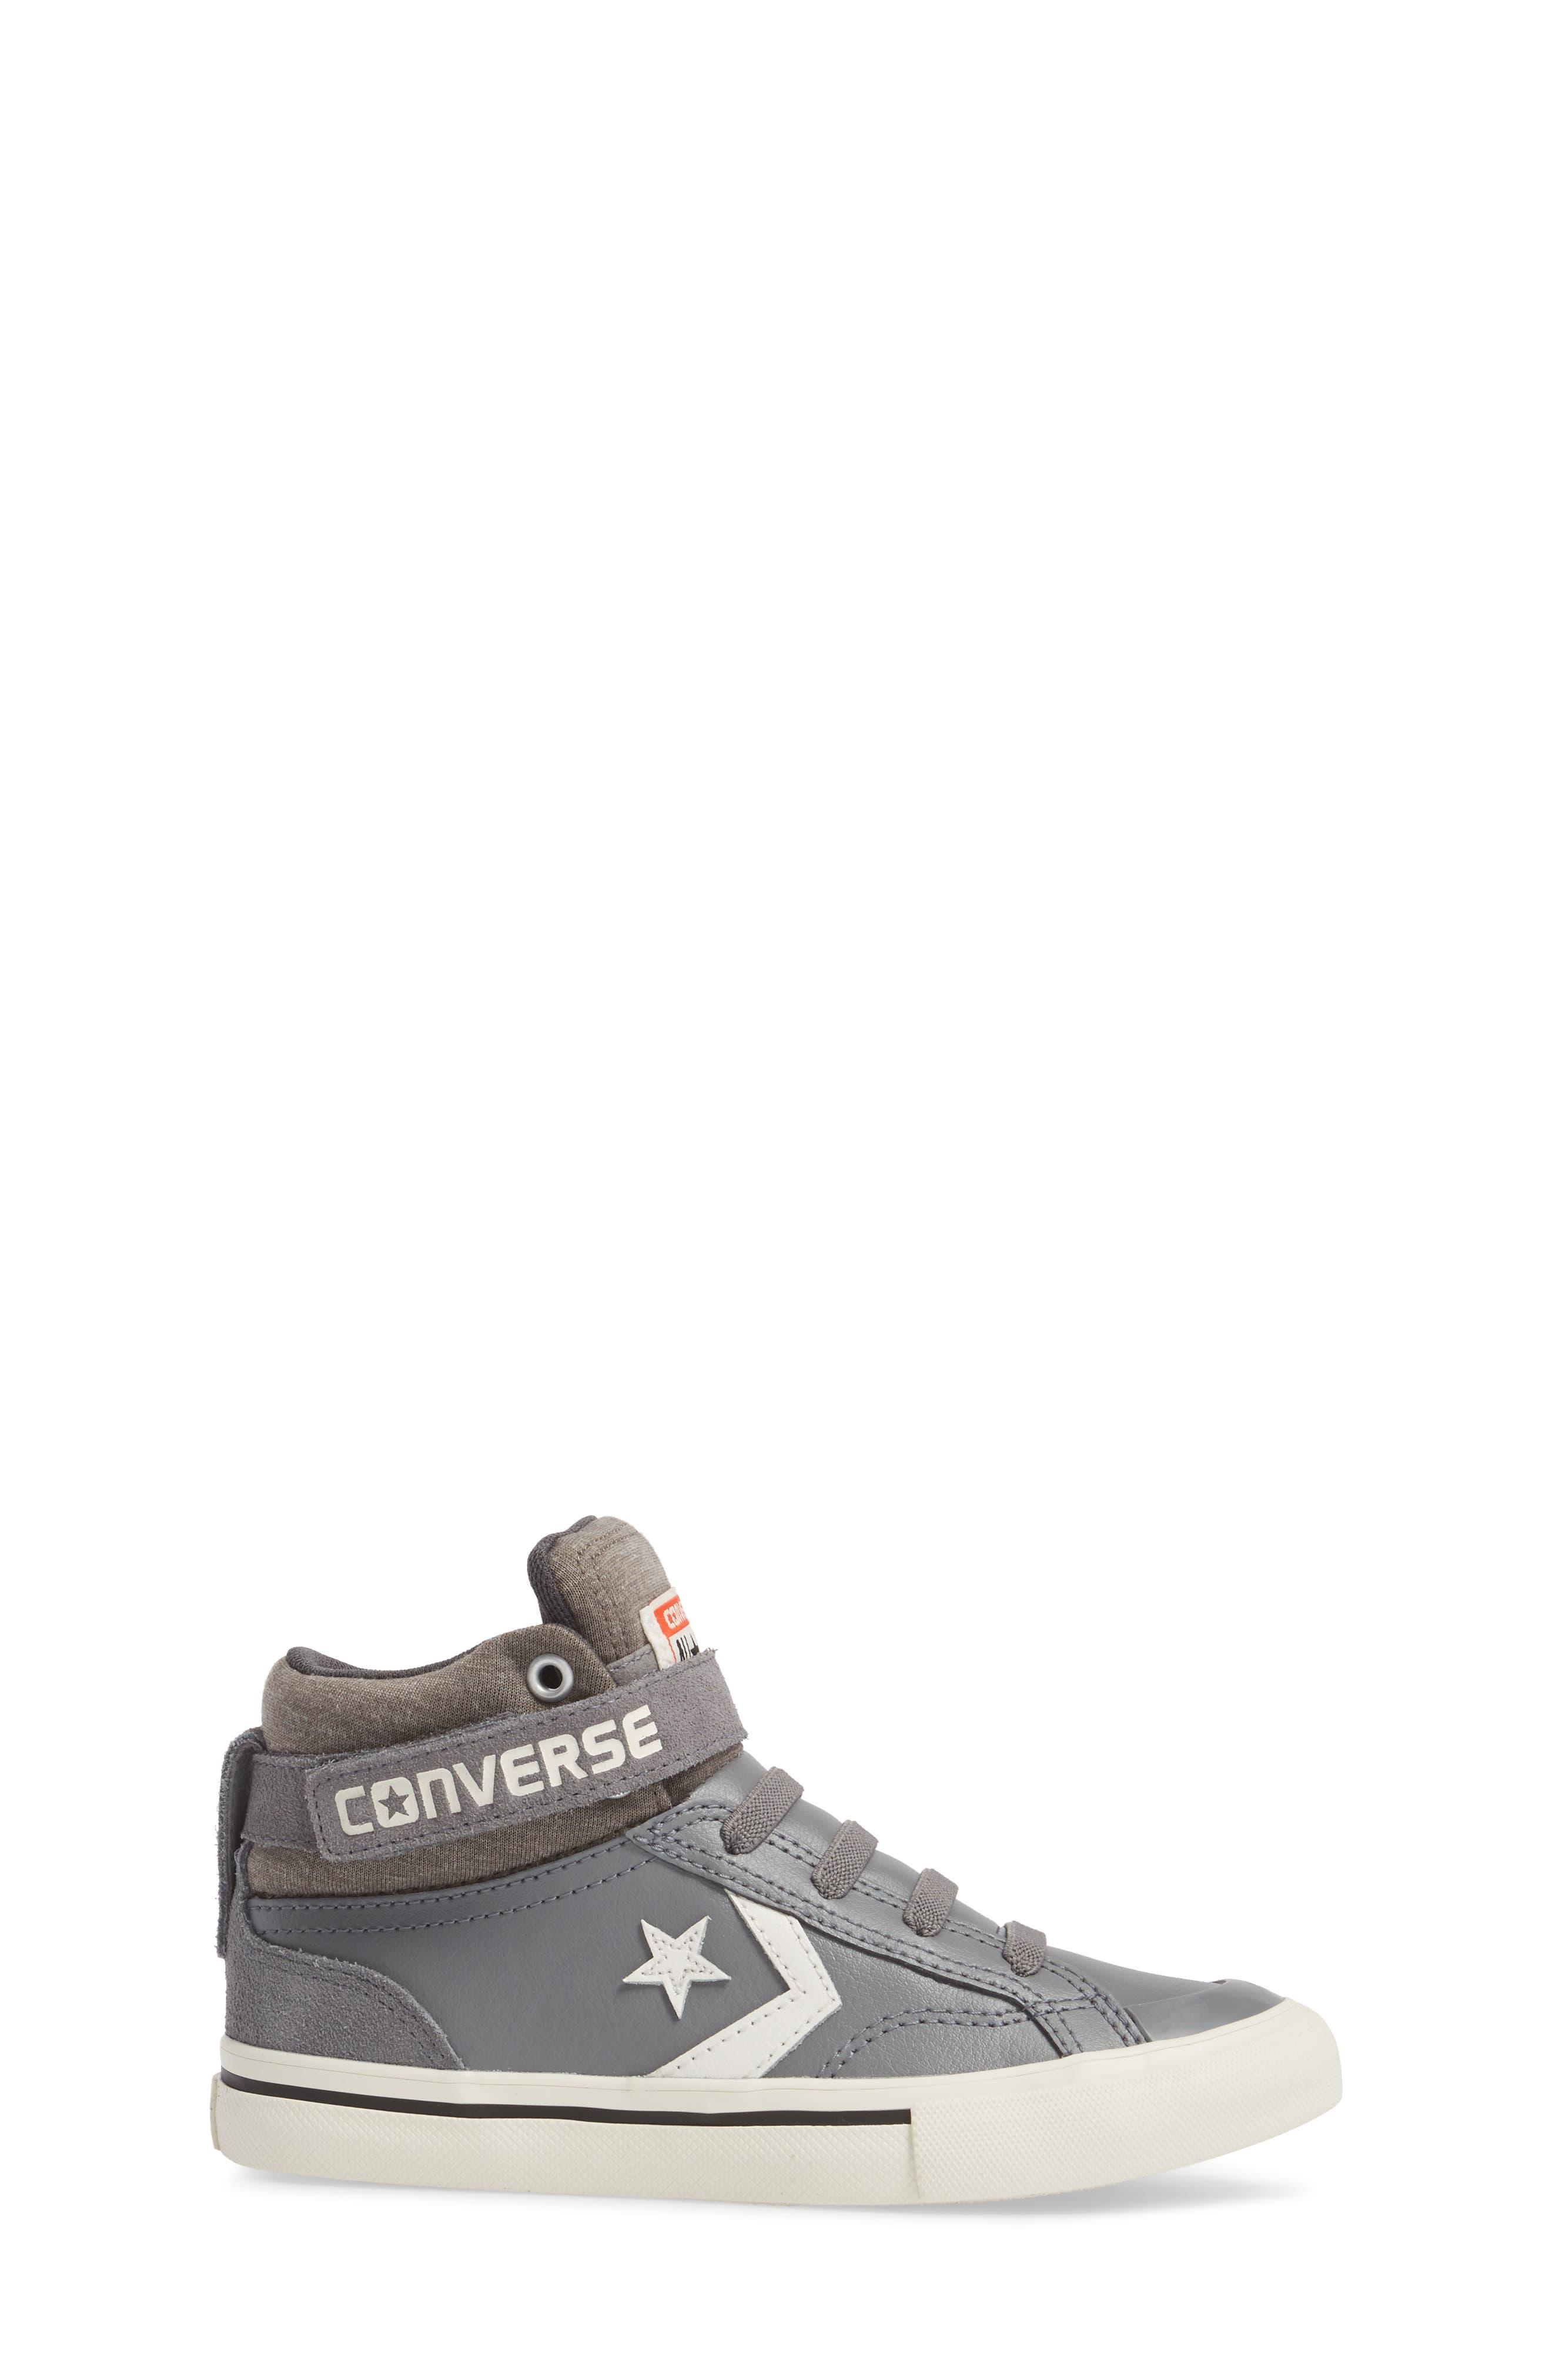 Pro Blaze High Top Sneaker,                             Alternate thumbnail 3, color,                             Mason Leather